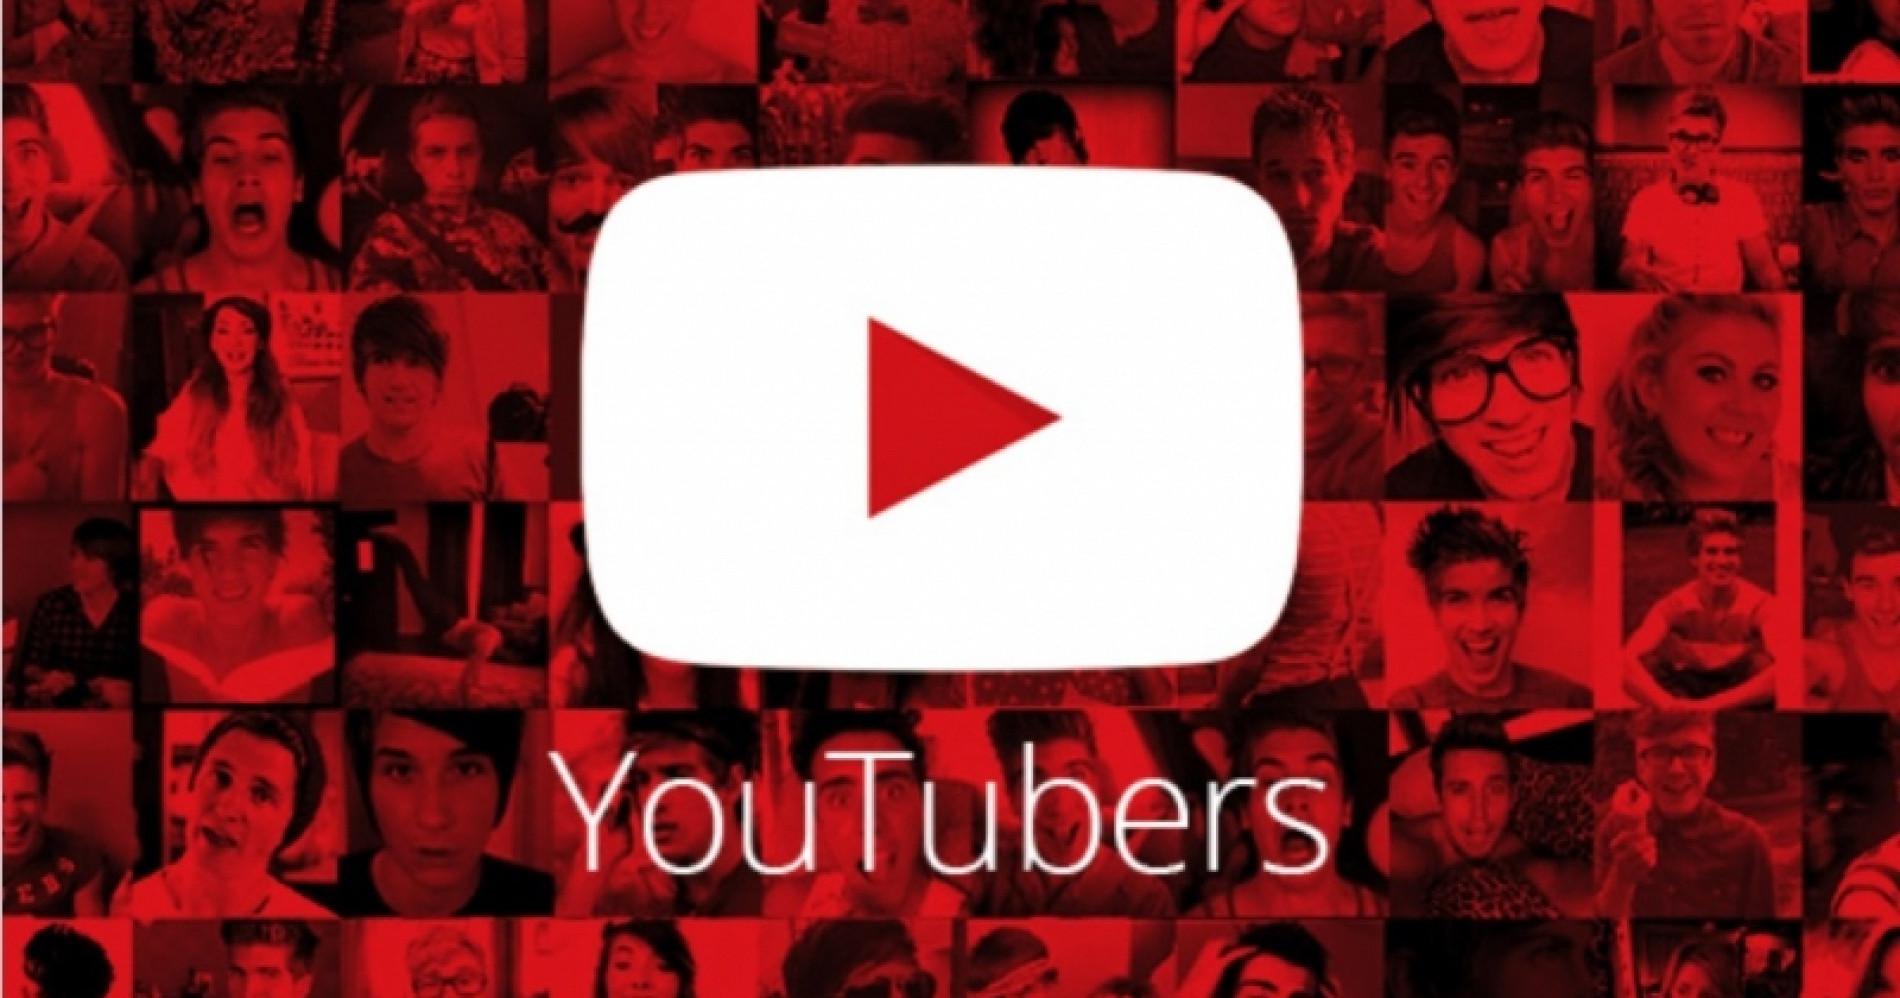 Menjadi YouTubers Ternyata Mudah (Sumber: Inibaru.id)